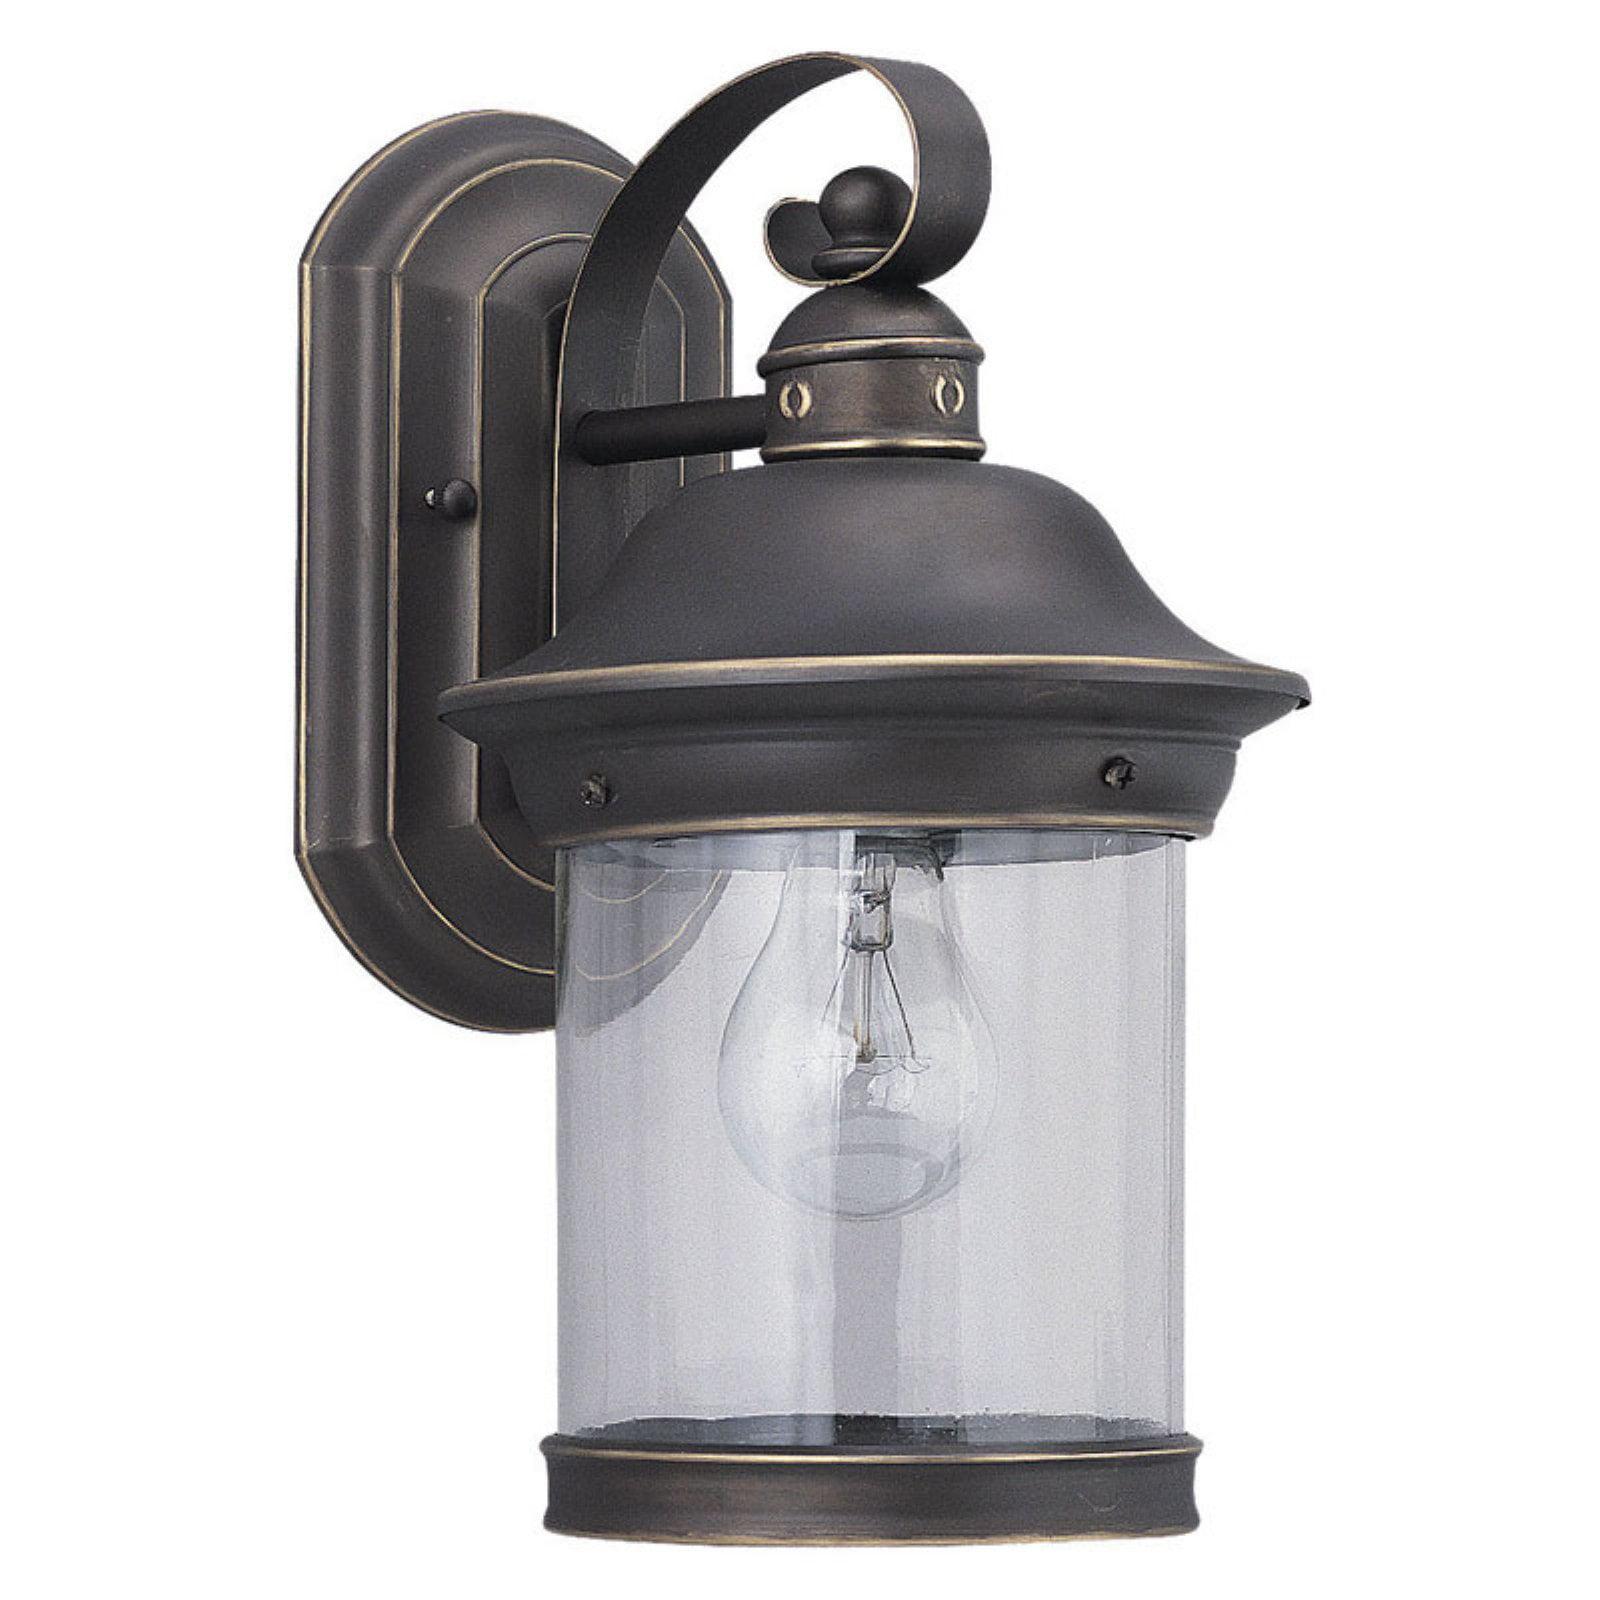 Sea Gull Hermitage Outdoor Wall Lantern - 13.5H in. Antique Bronze